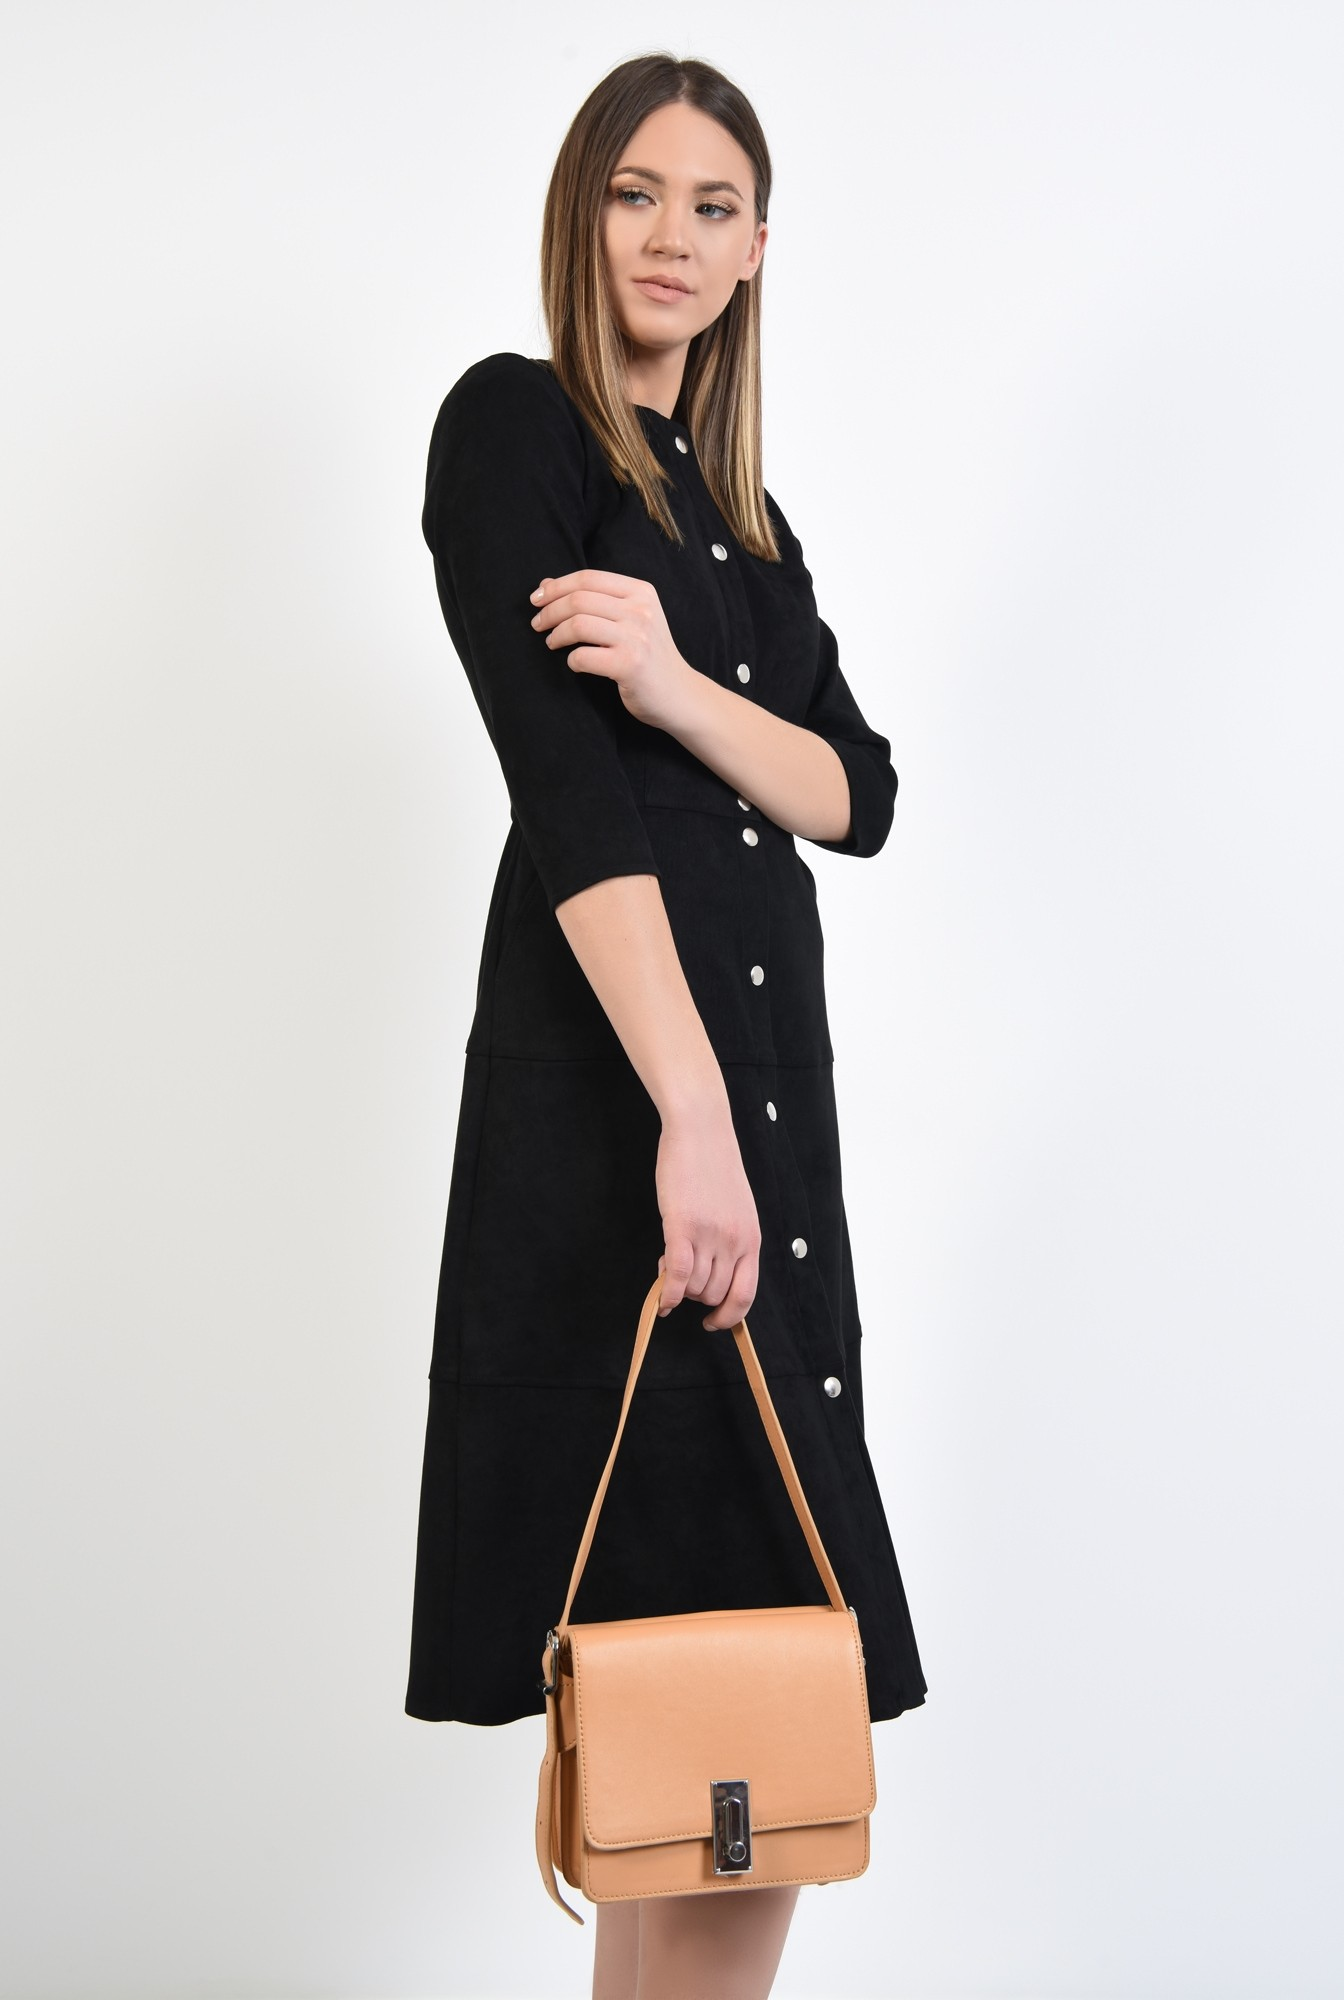 2 - rochie neagra, midi, evazata, din piele intoarsa ecologica